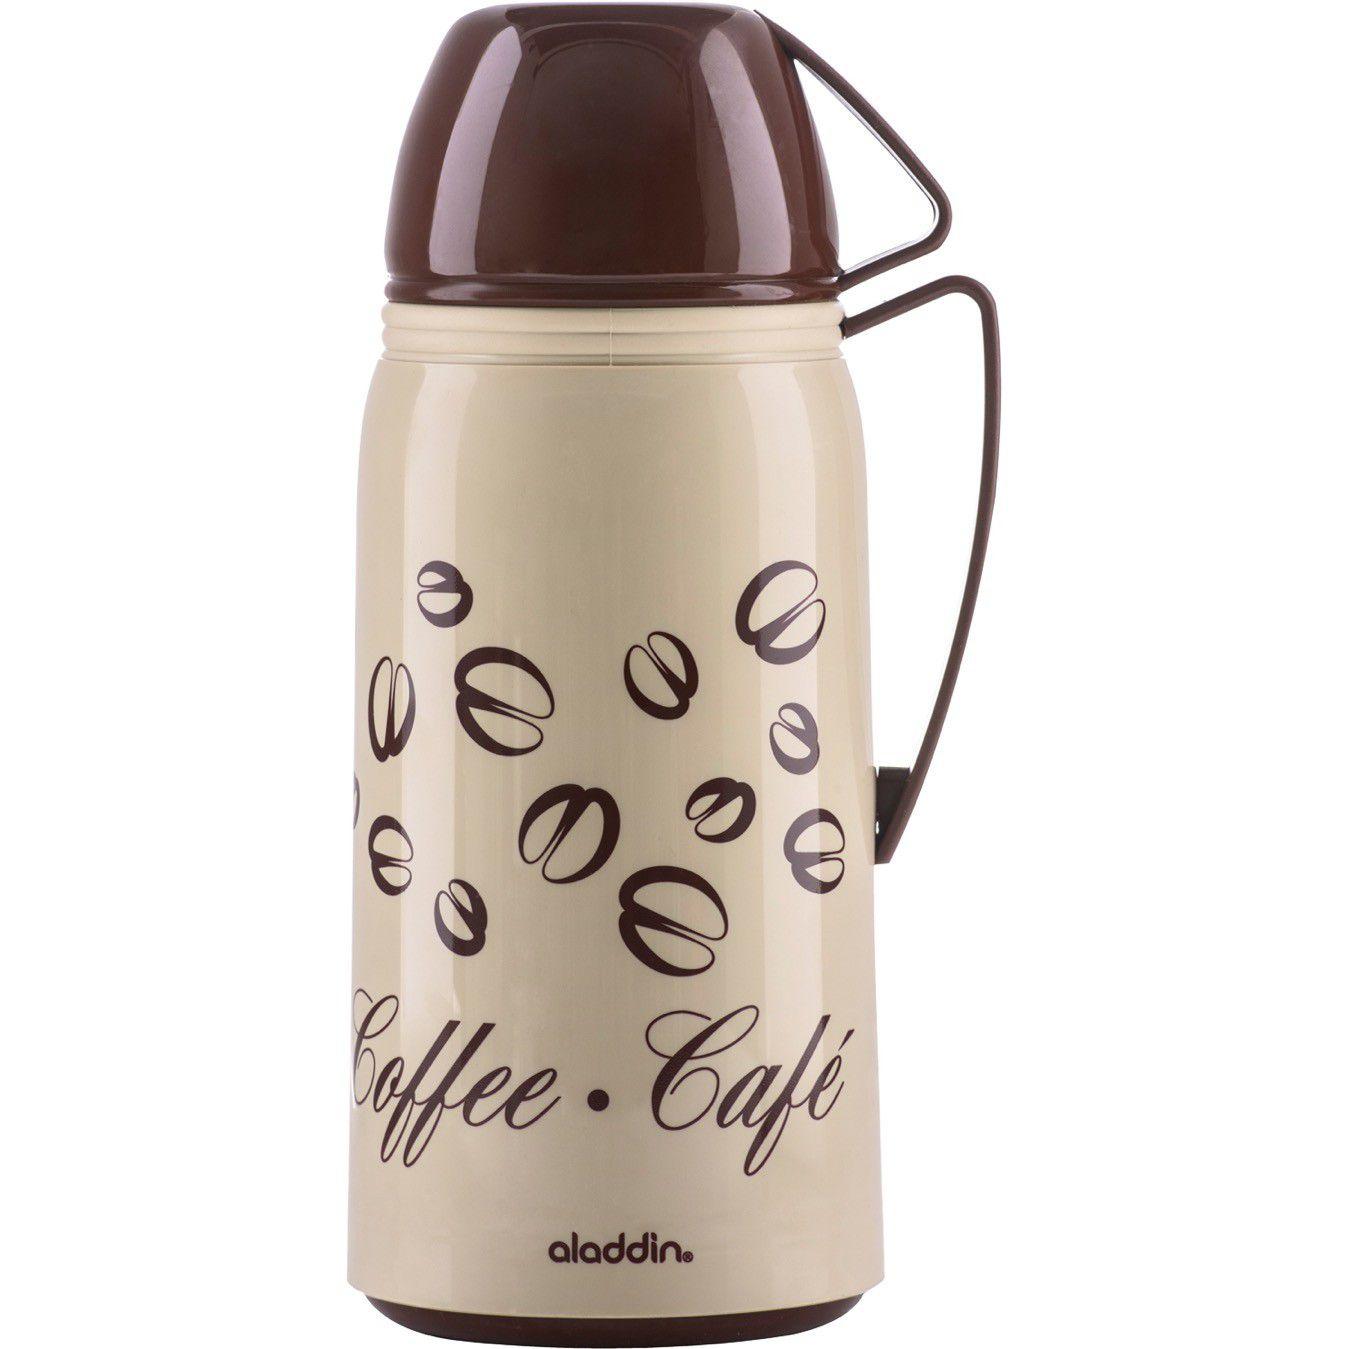 Garrafa Aladdin Coffee 1Litro Rolha Cx/6